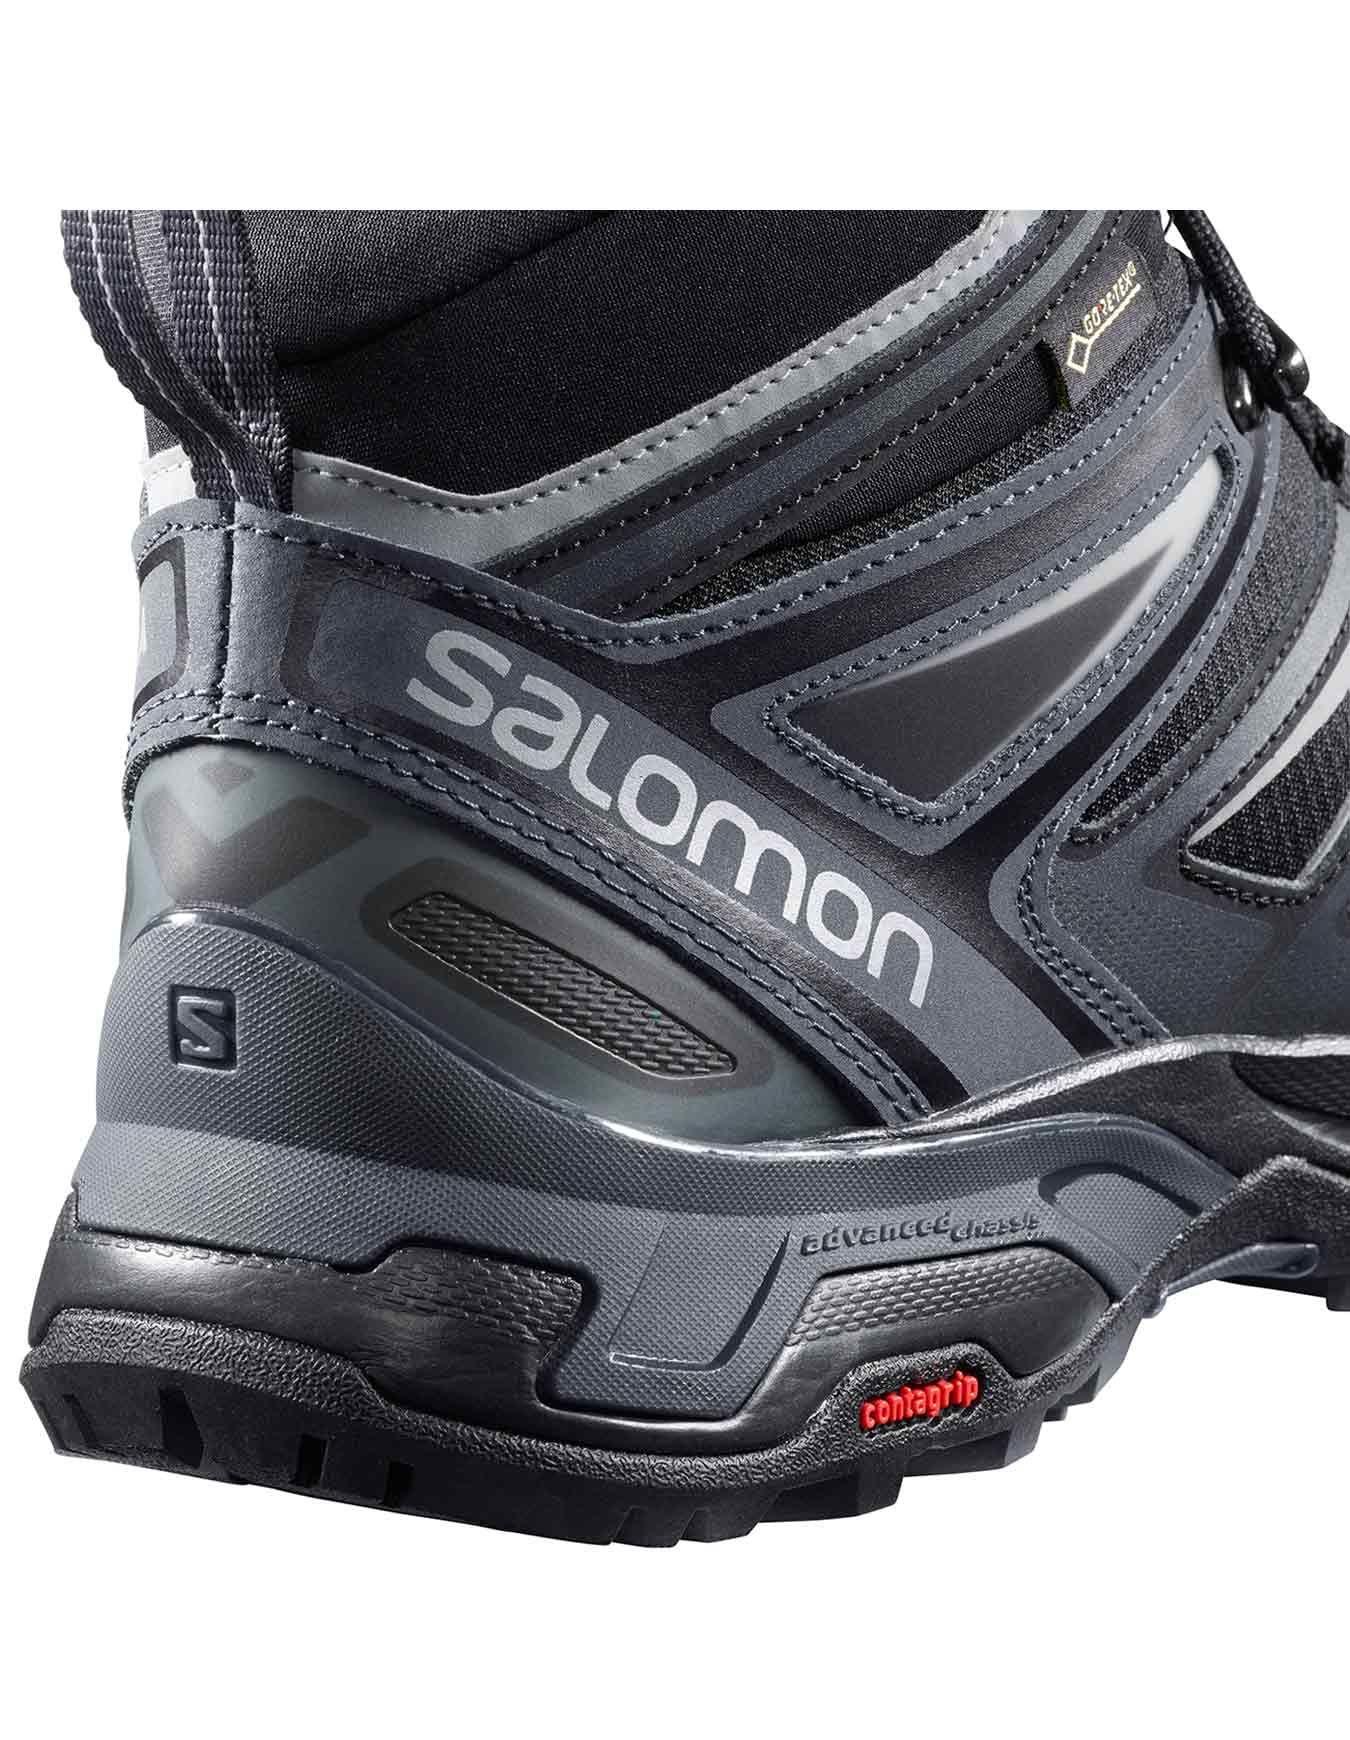 Homme Ultra 3 Randonnée Salomon Mid Ink Chaussures Gtx Bkindia X 4z1wqz